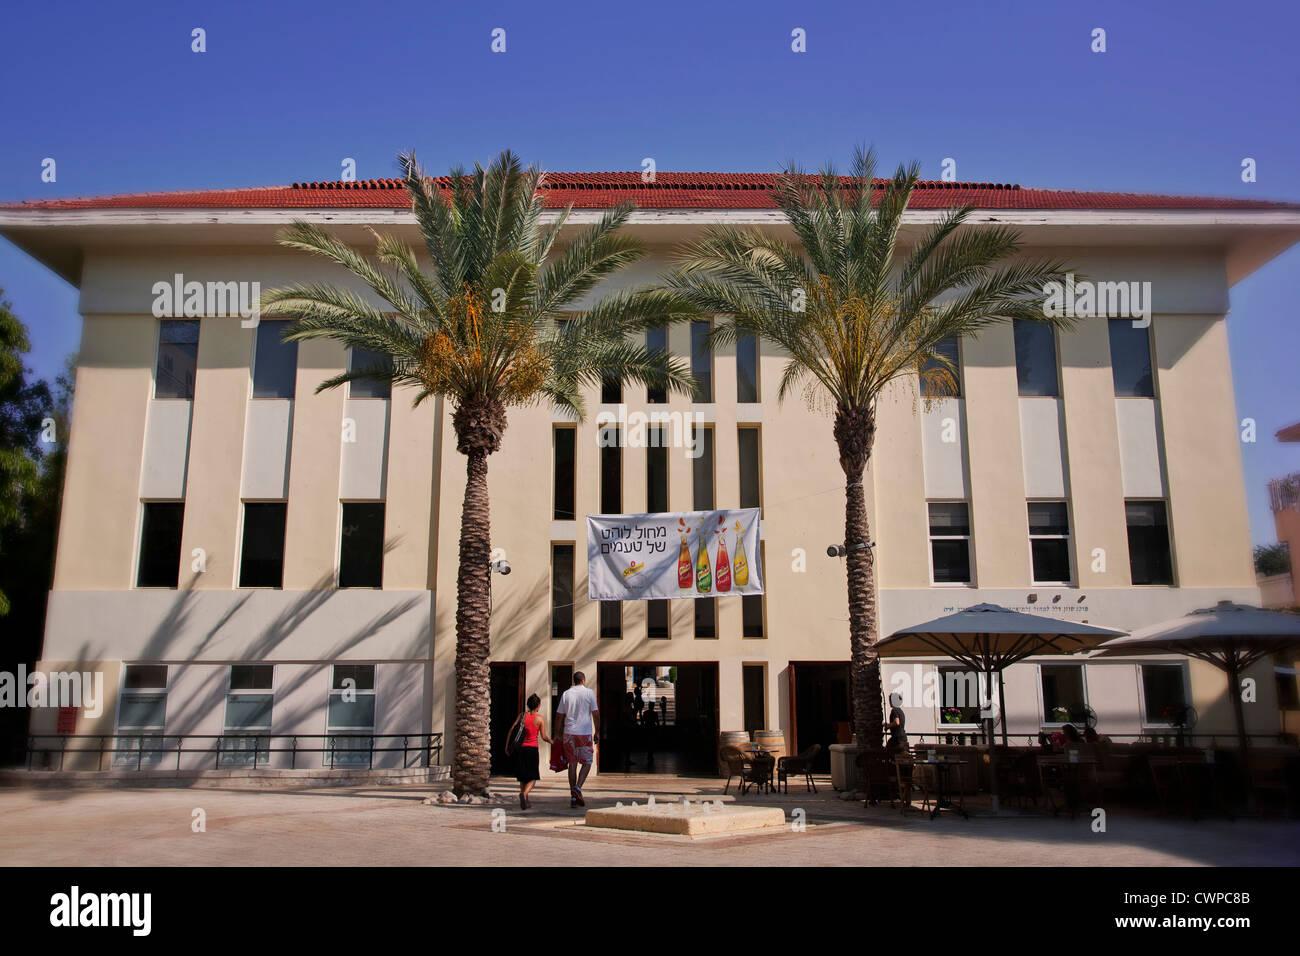 Middle East. Israel. Tel Aviv. The Suzanne Dellal Centre for Dance and Theatre (Batsheva Dance Company). - Stock Image